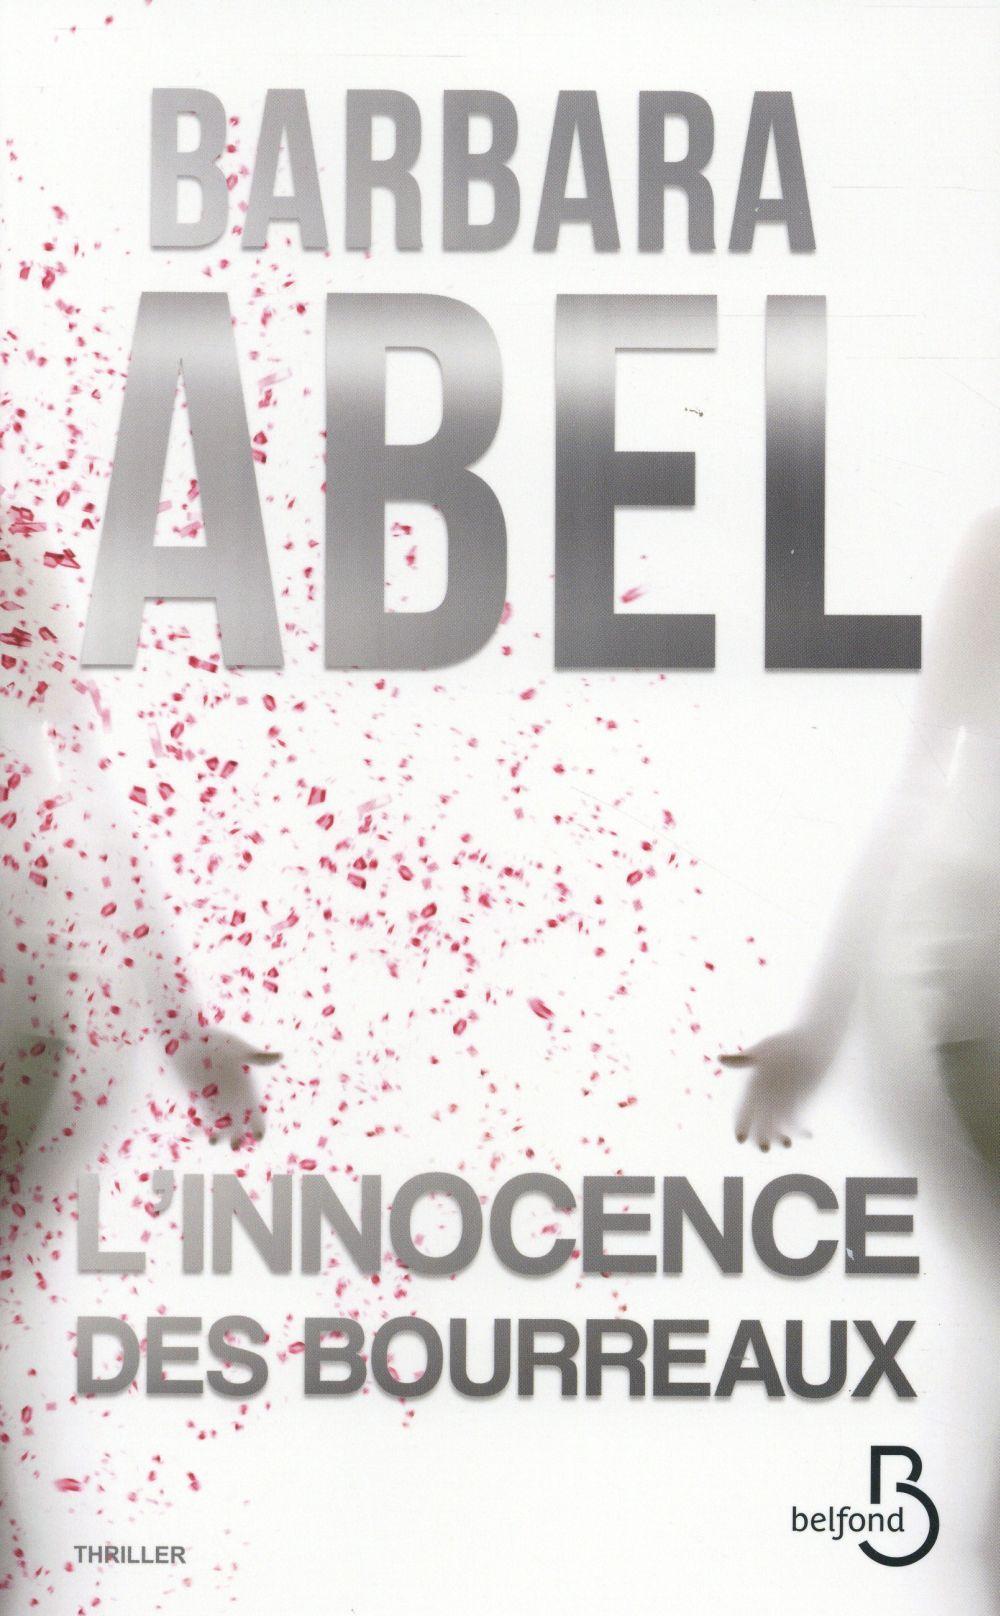 Abel Barbara - L'INNOCENCE DES BOURREAUX